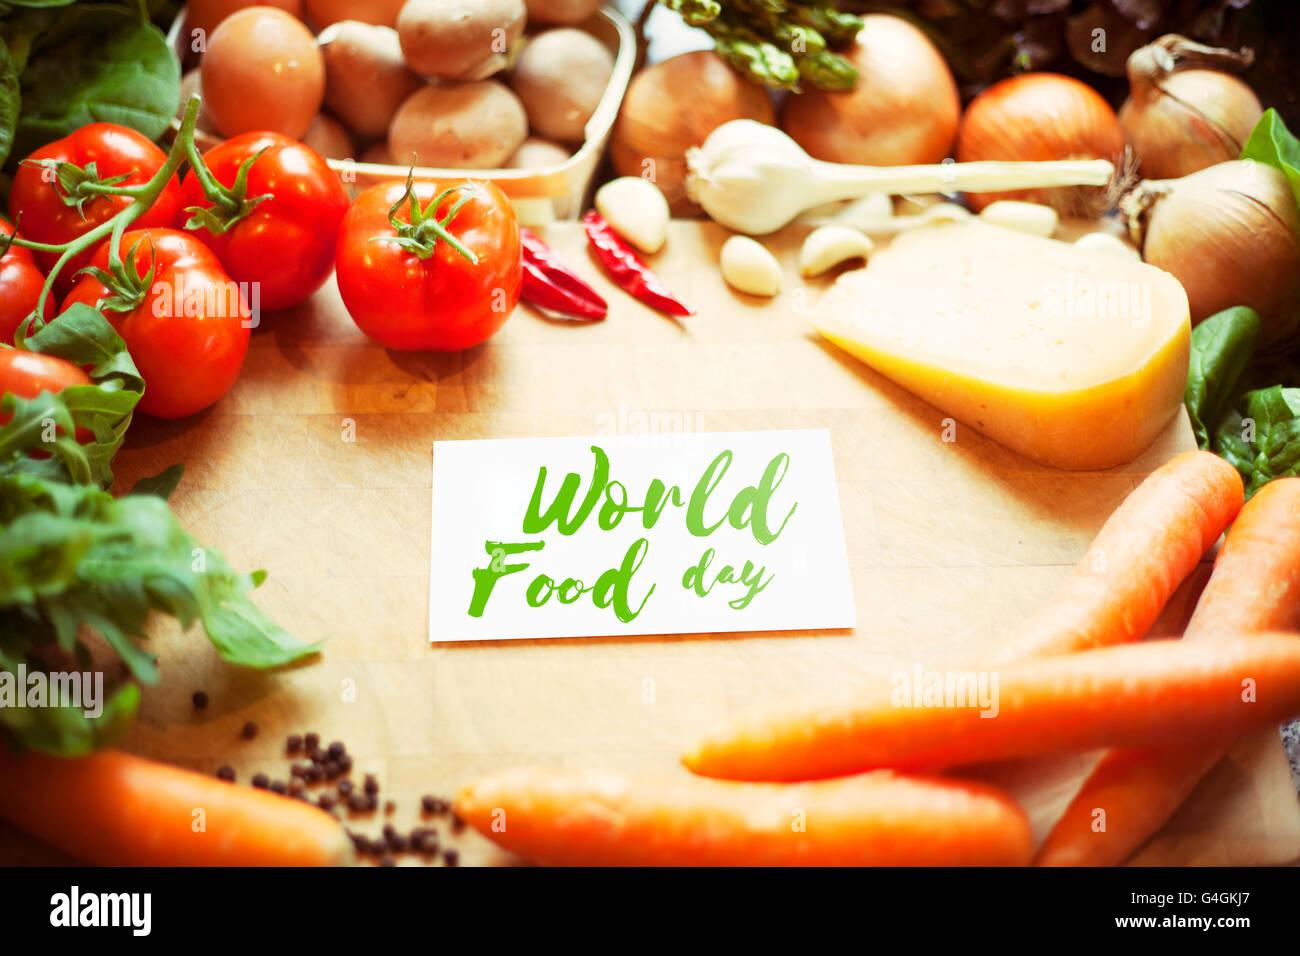 International Food Day - Stock Image